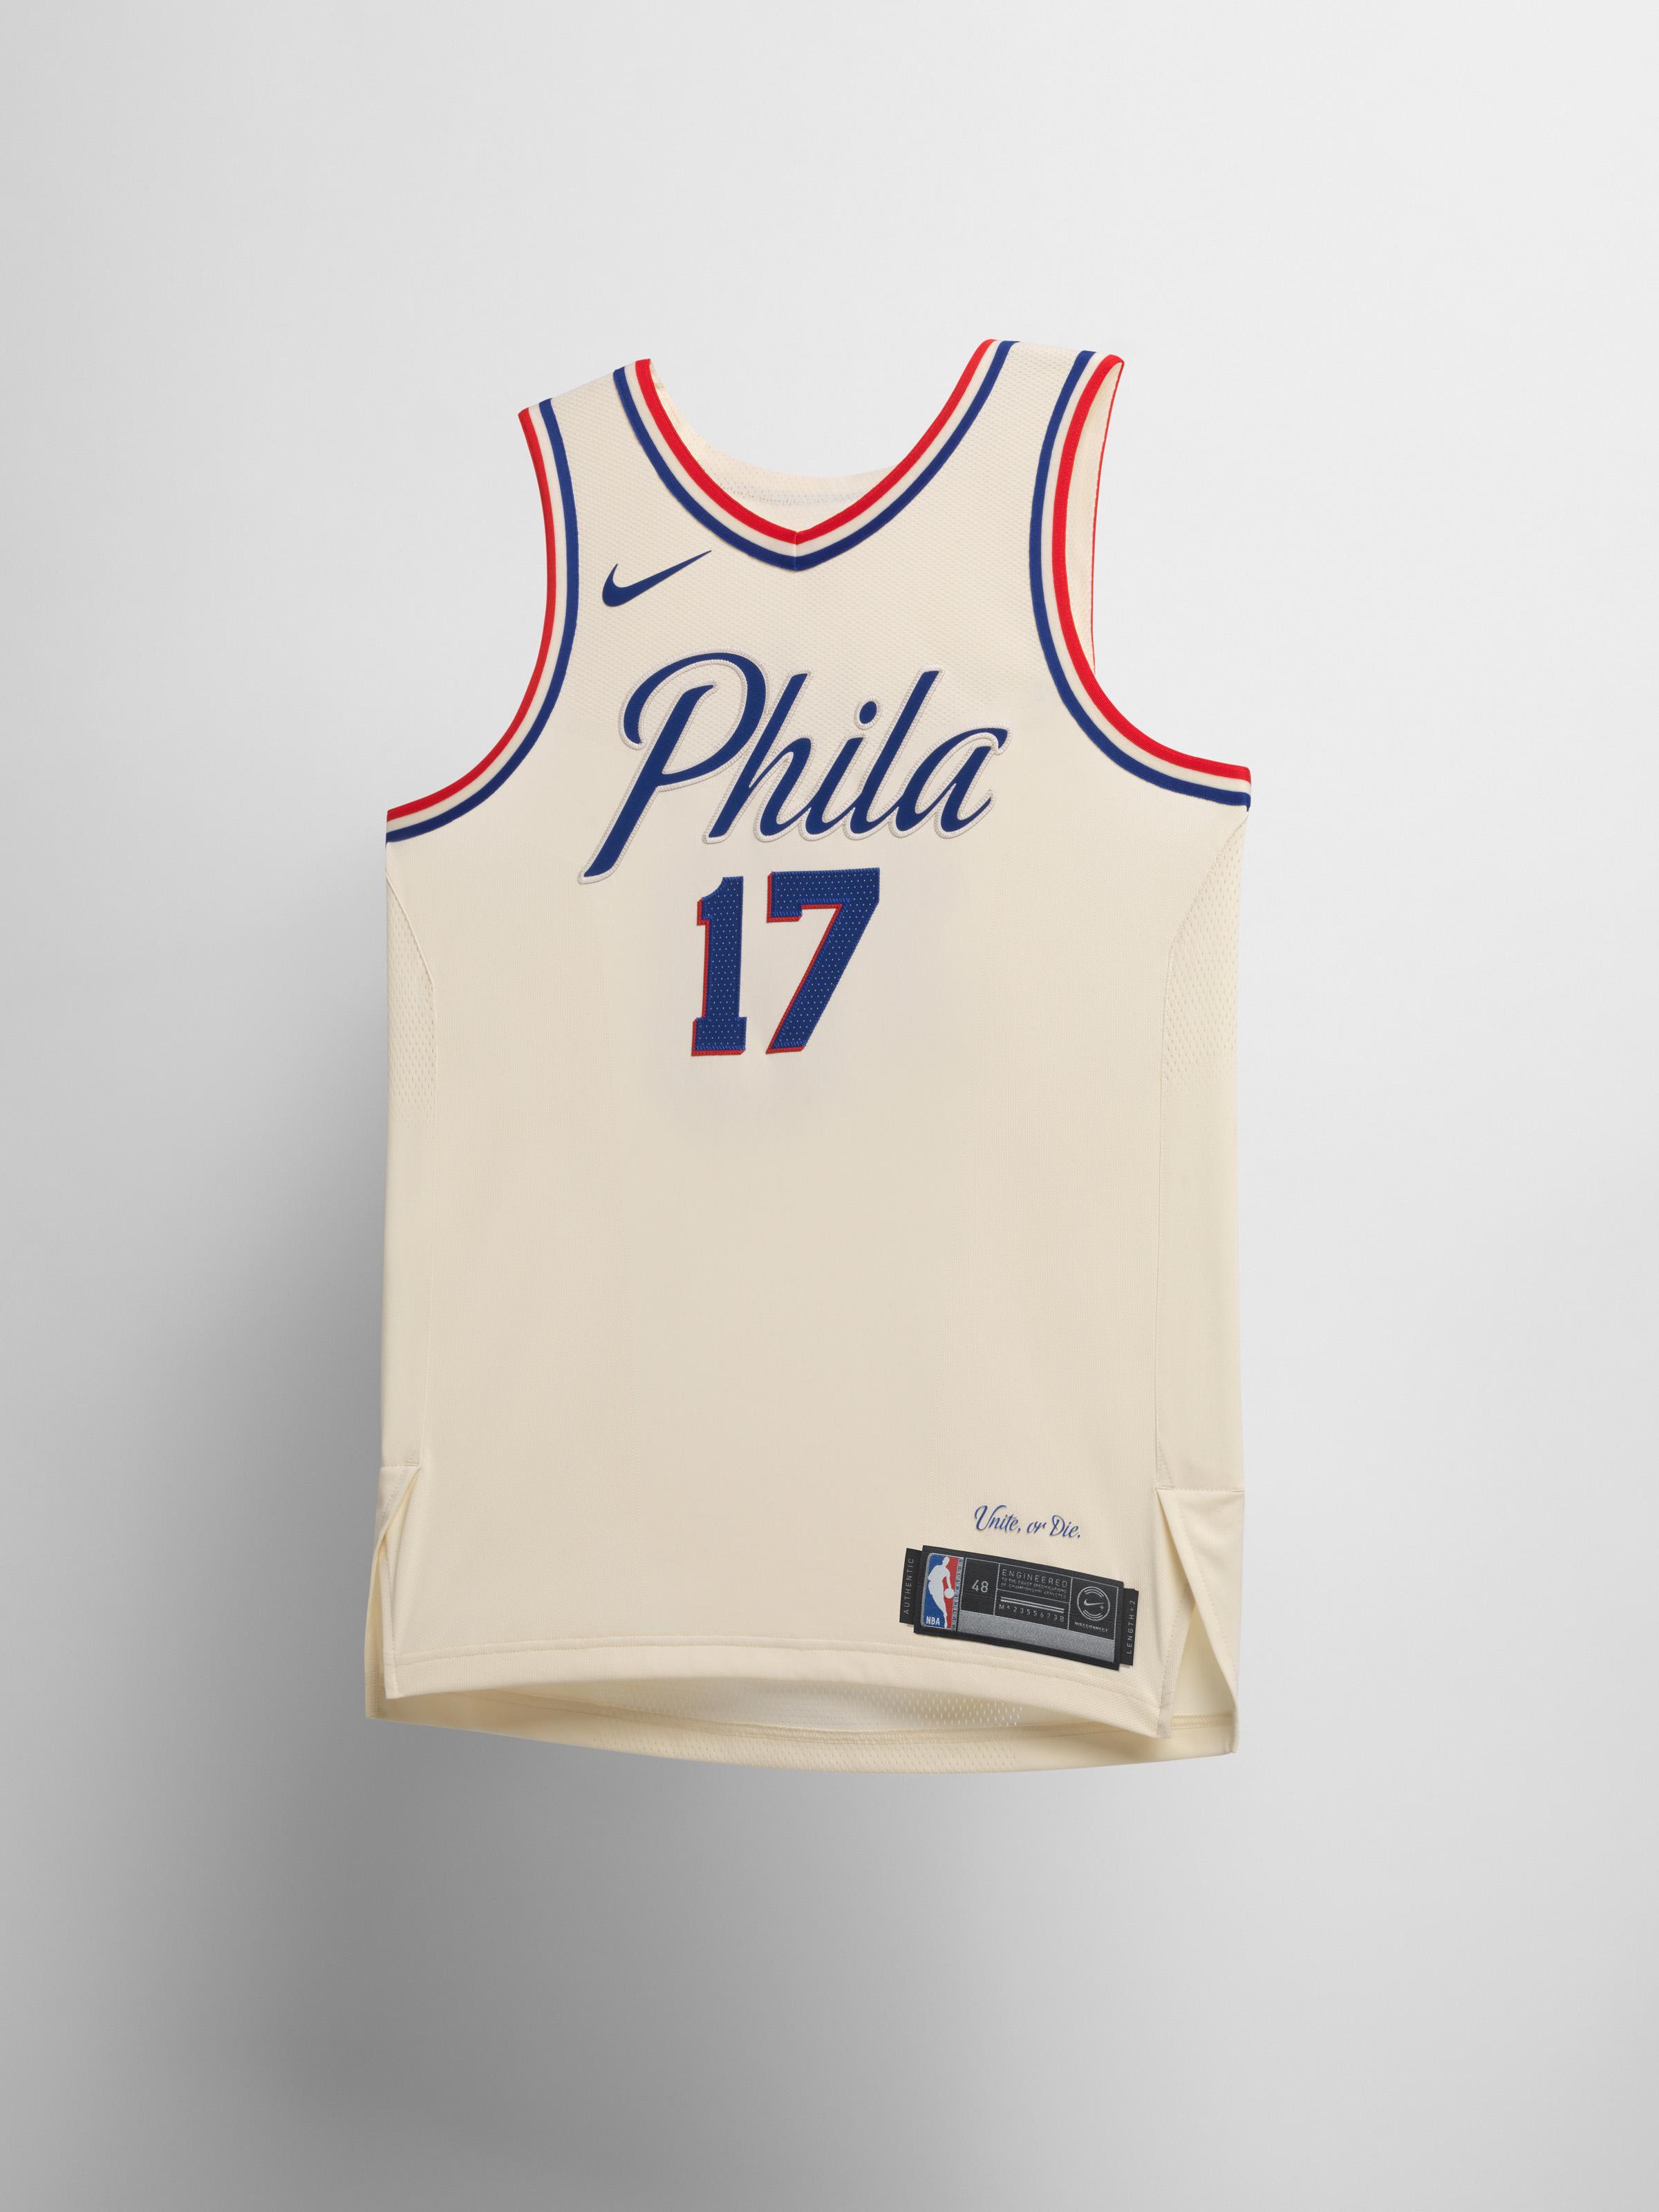 brand new 1ec9c fe60b Nike unveils City Edition uniforms for 26 NBA teams